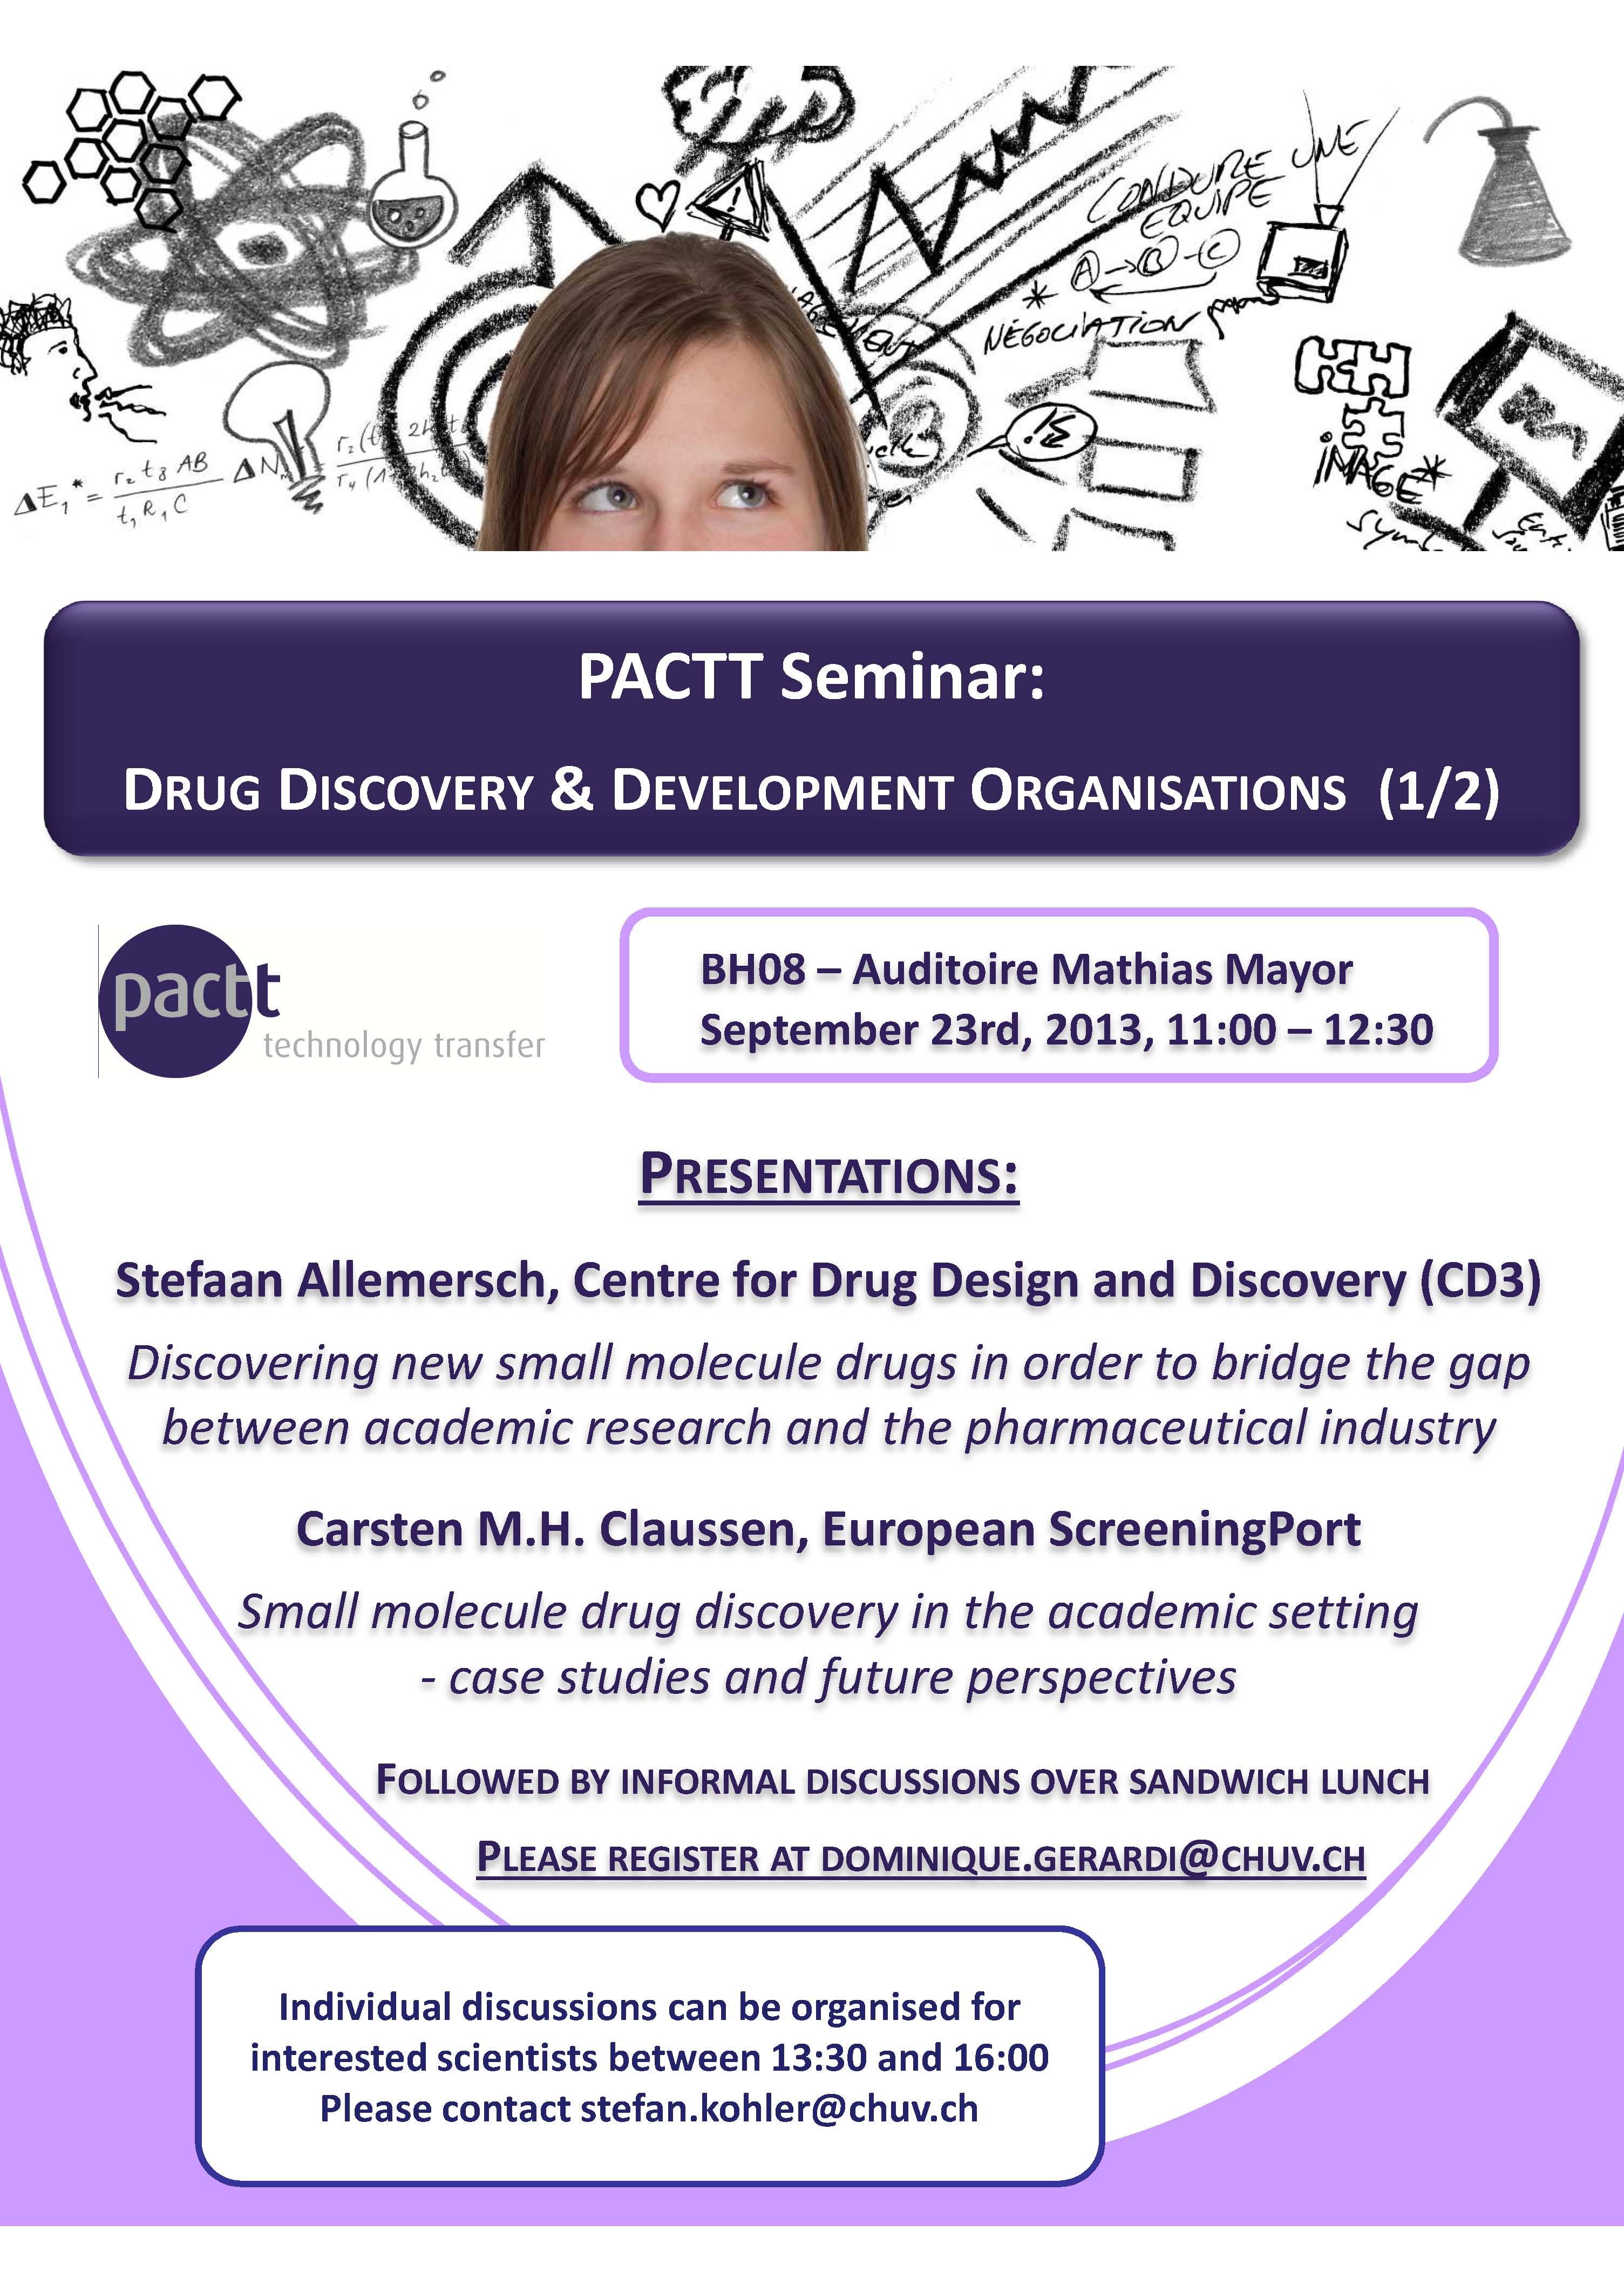 PACTT Seminar September 23